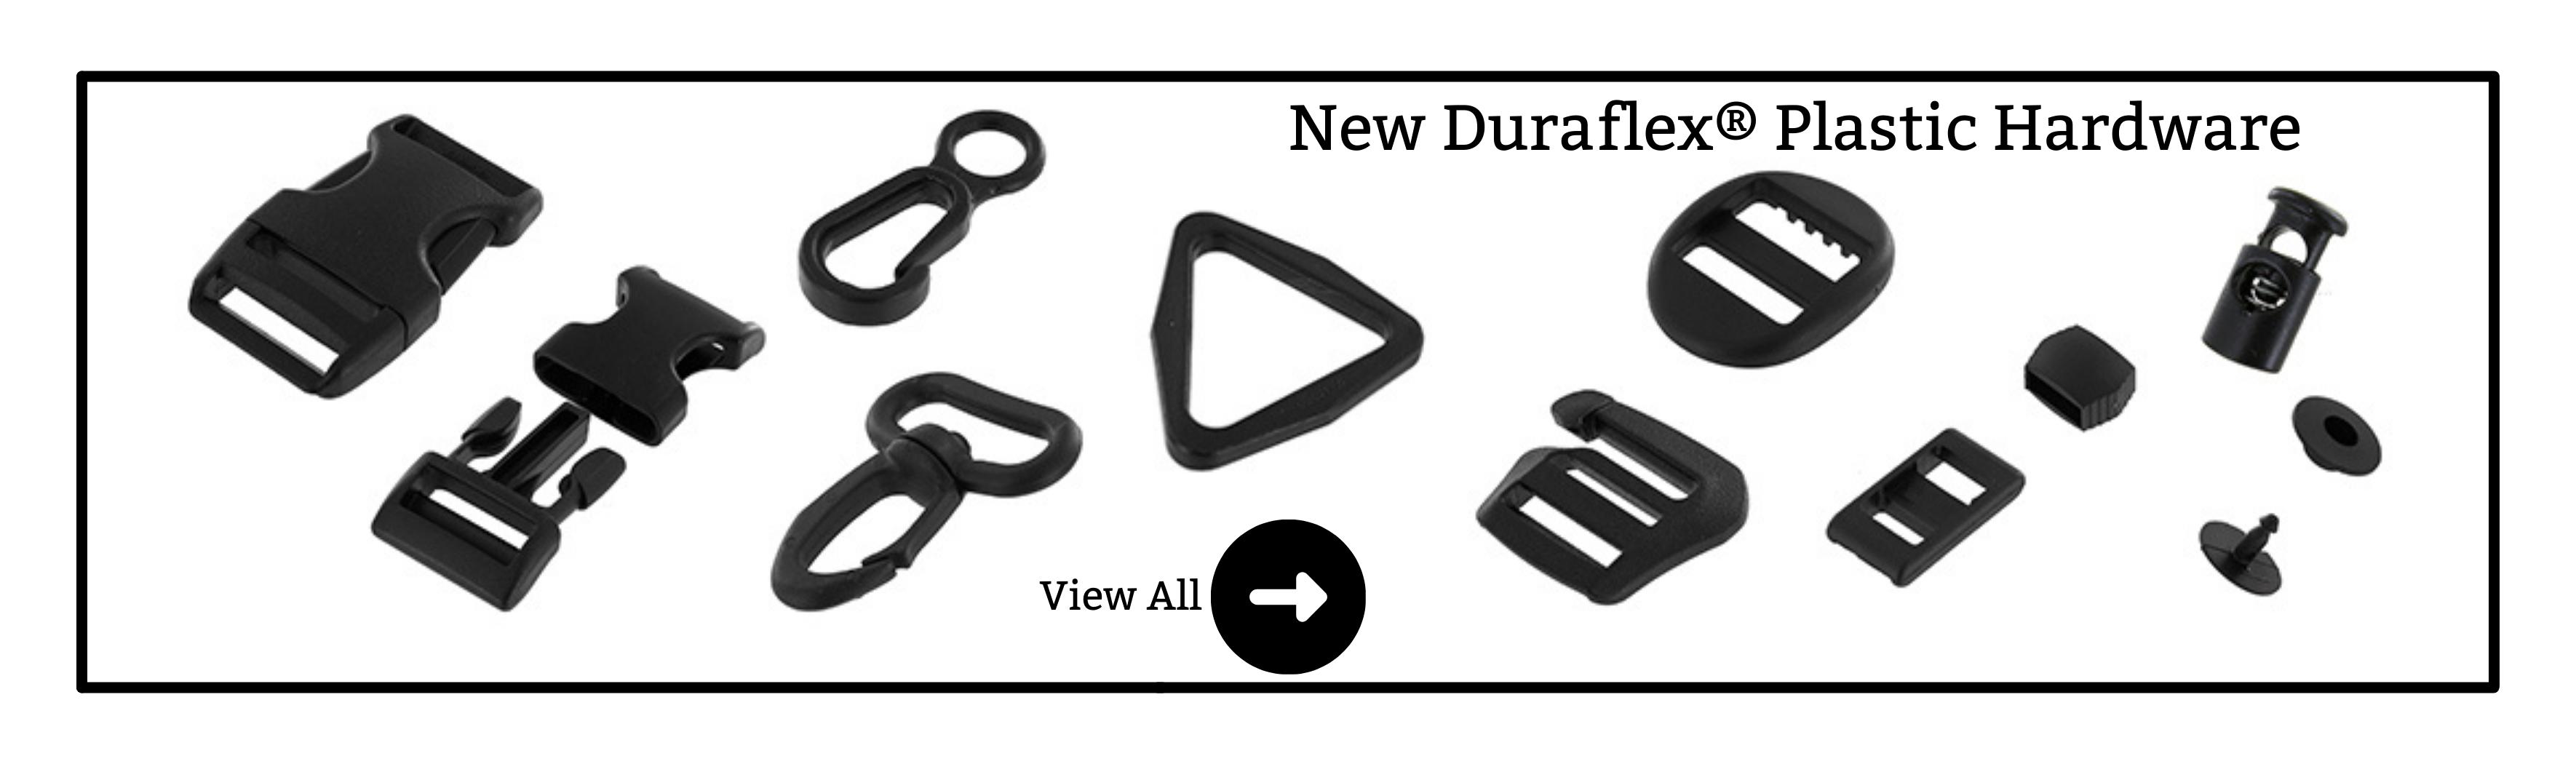 Duraflex Plastic Hardware From Buckleguy